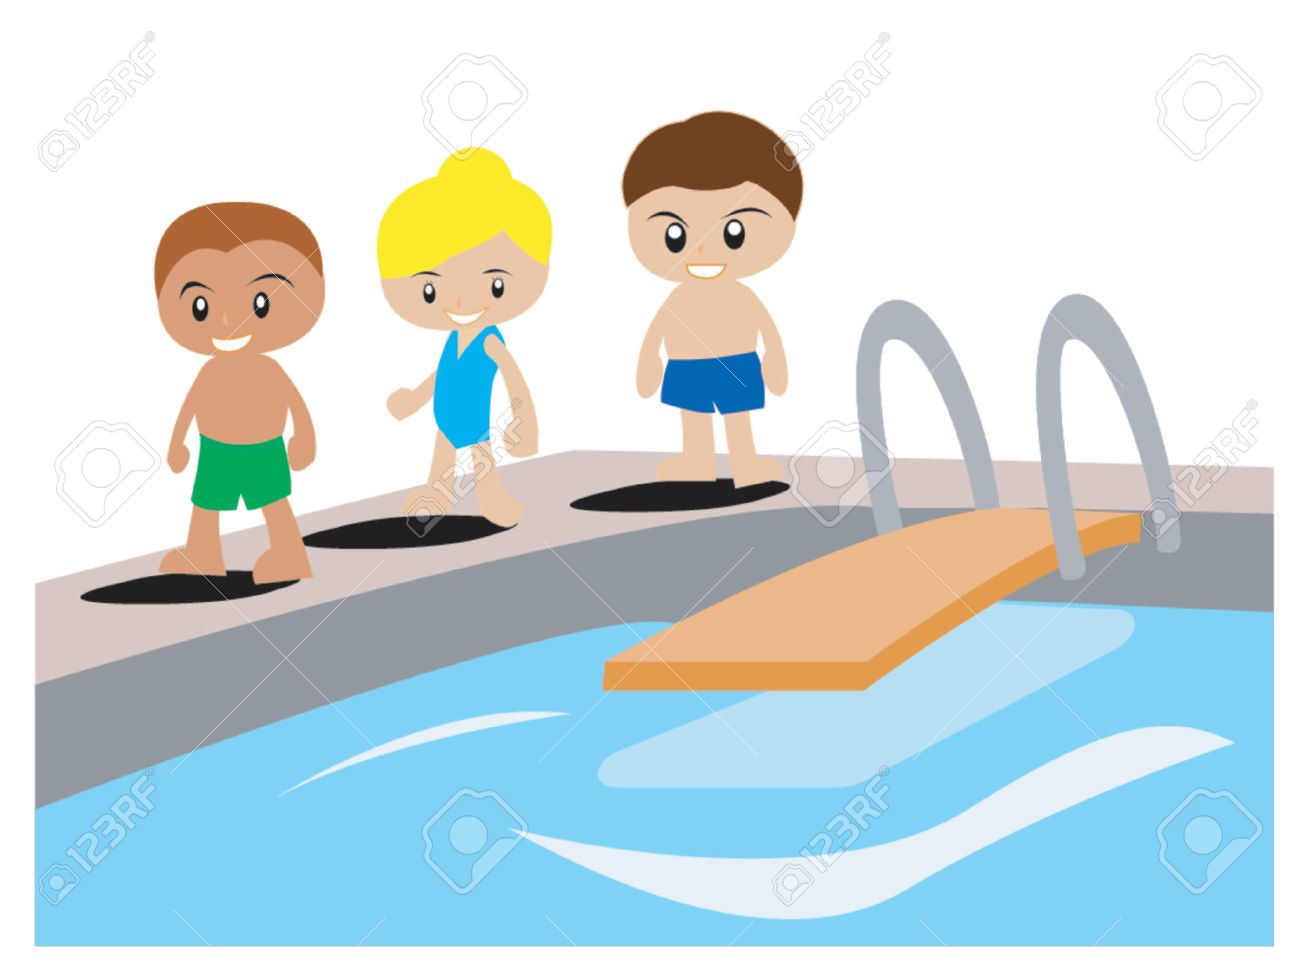 Boys swimming pool clipart-Boys swimming pool clipart-11